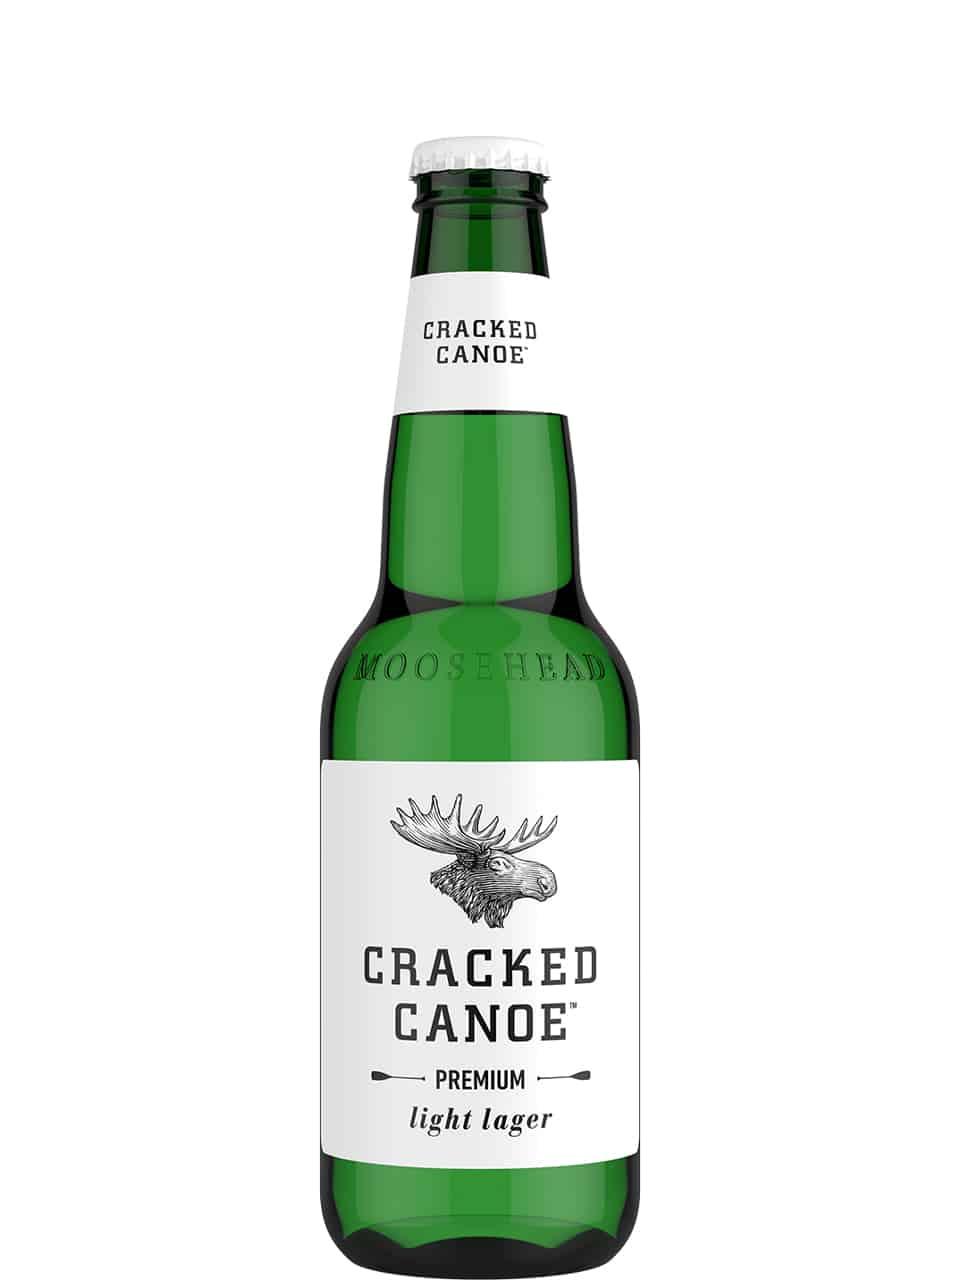 Moosehead Cracked Canoe 12 Pk Bottles